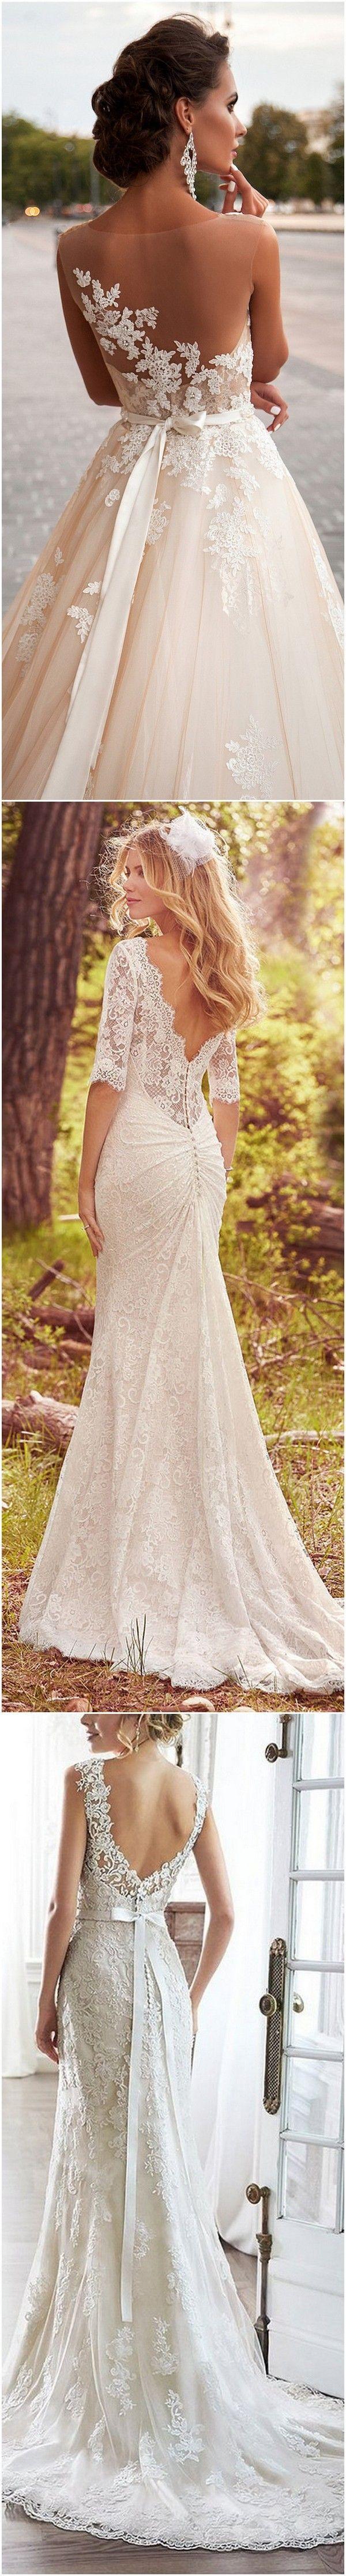 vintage low back lace wedding dresses